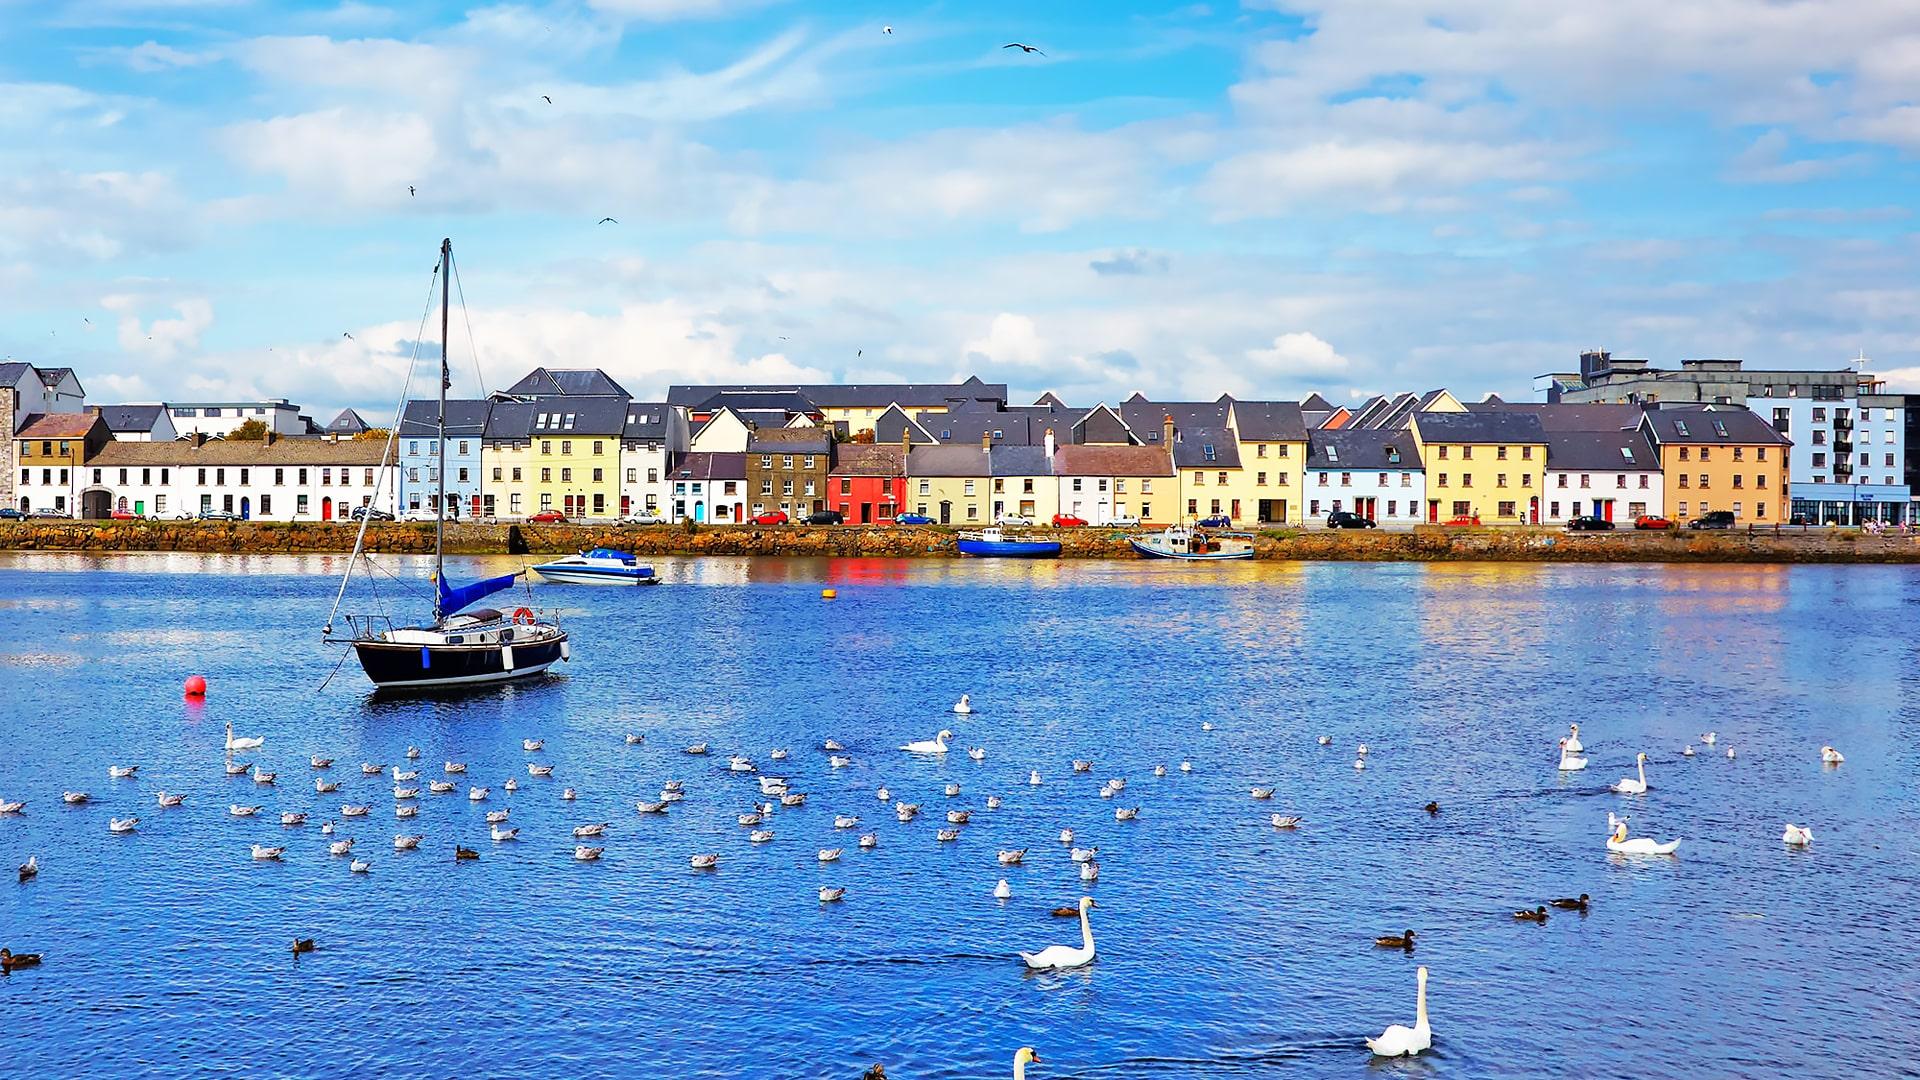 Escuela de inglés en Galway | GCI Galway Cultural Institute